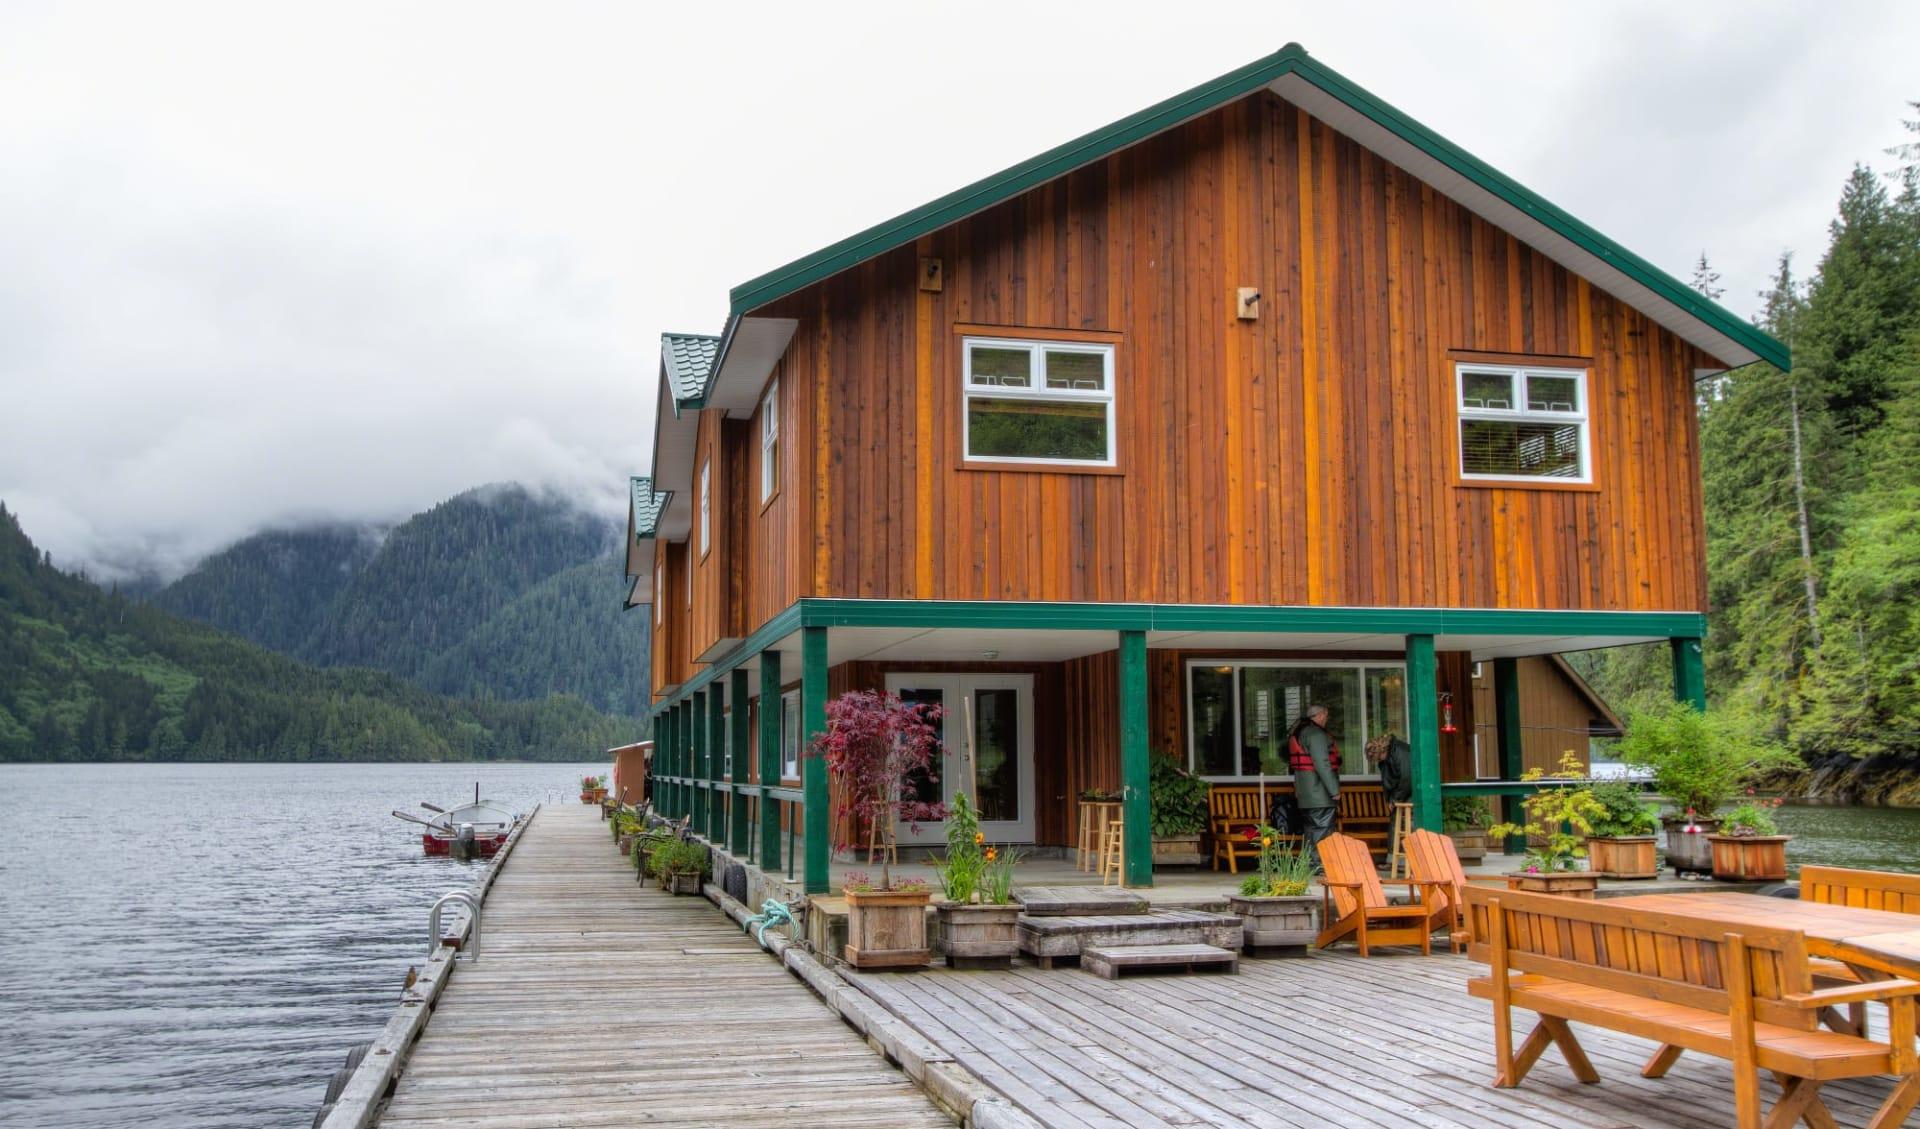 Bärenbeobachtung Great Bear Lodge 7 Tage ab Port Hardy: exterior: Great Bear Lodge - Lodge von aussen